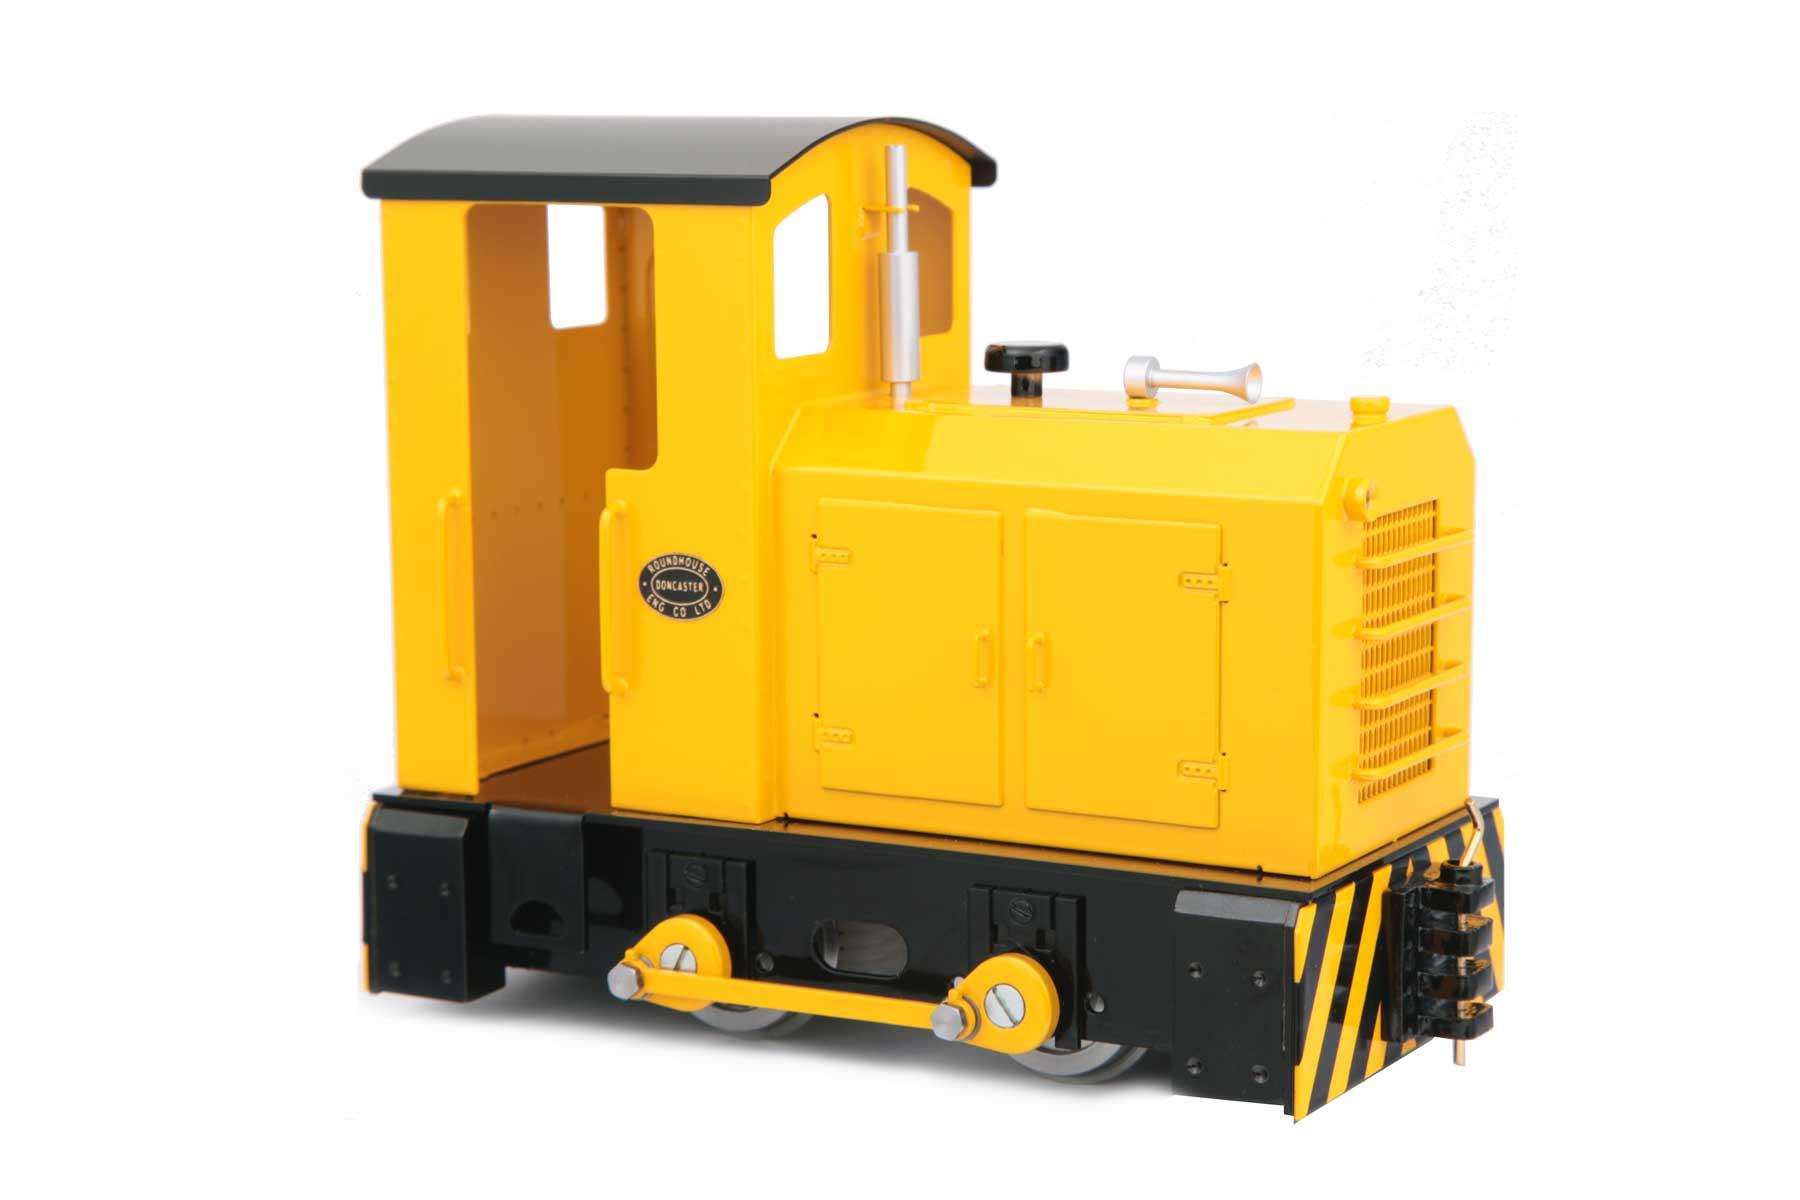 test bulldog Diesel locomotive for sale 03